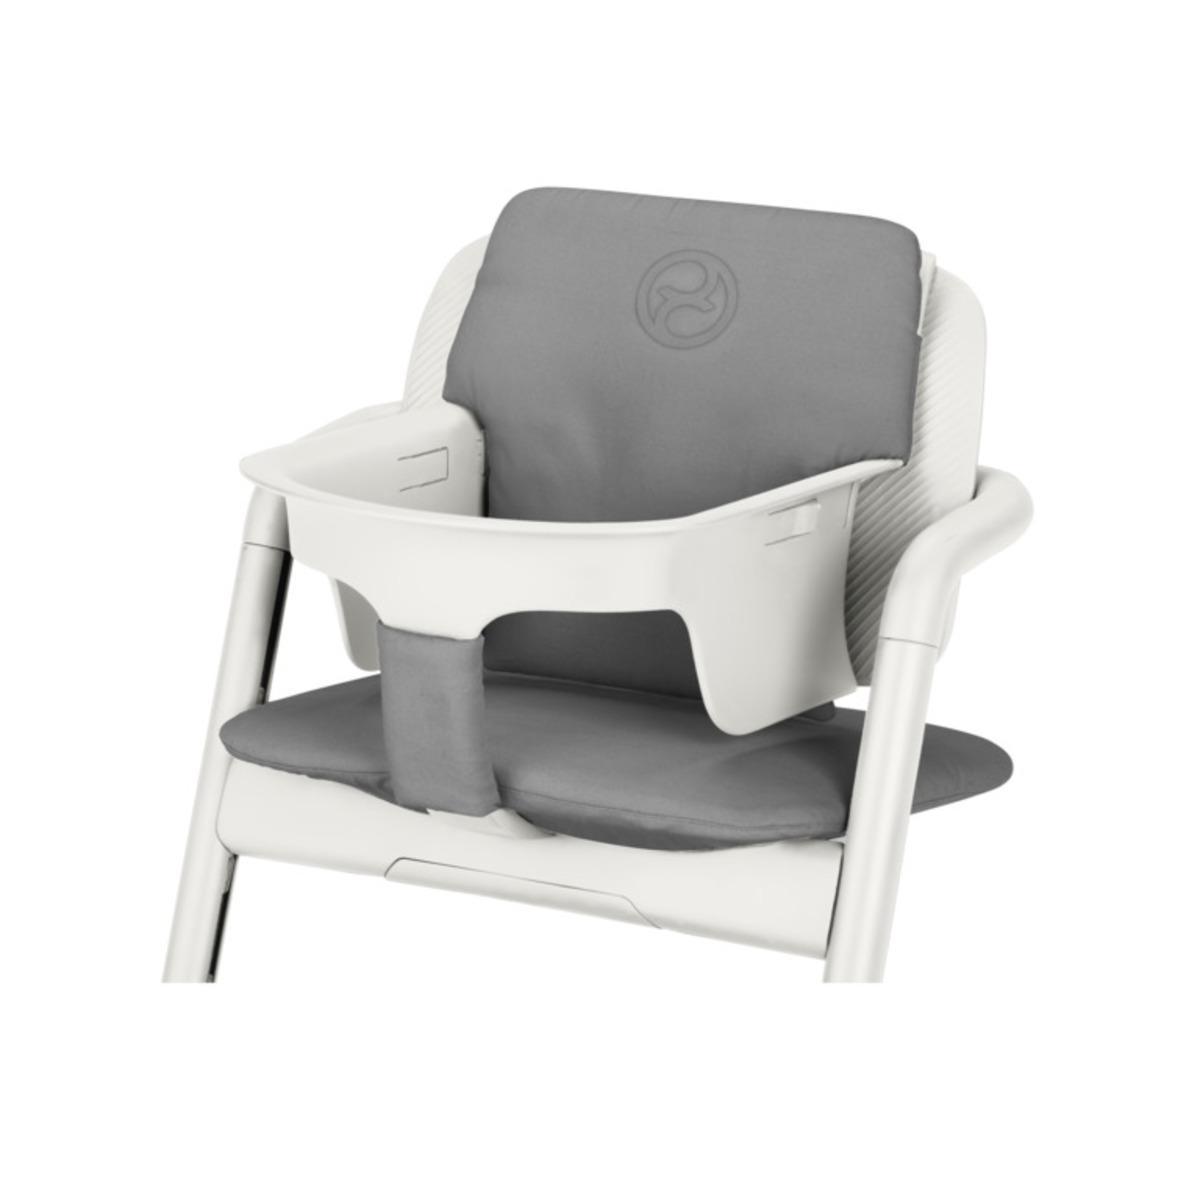 Cojín reductor trona bebé LEMO Cybex storm grey-grey